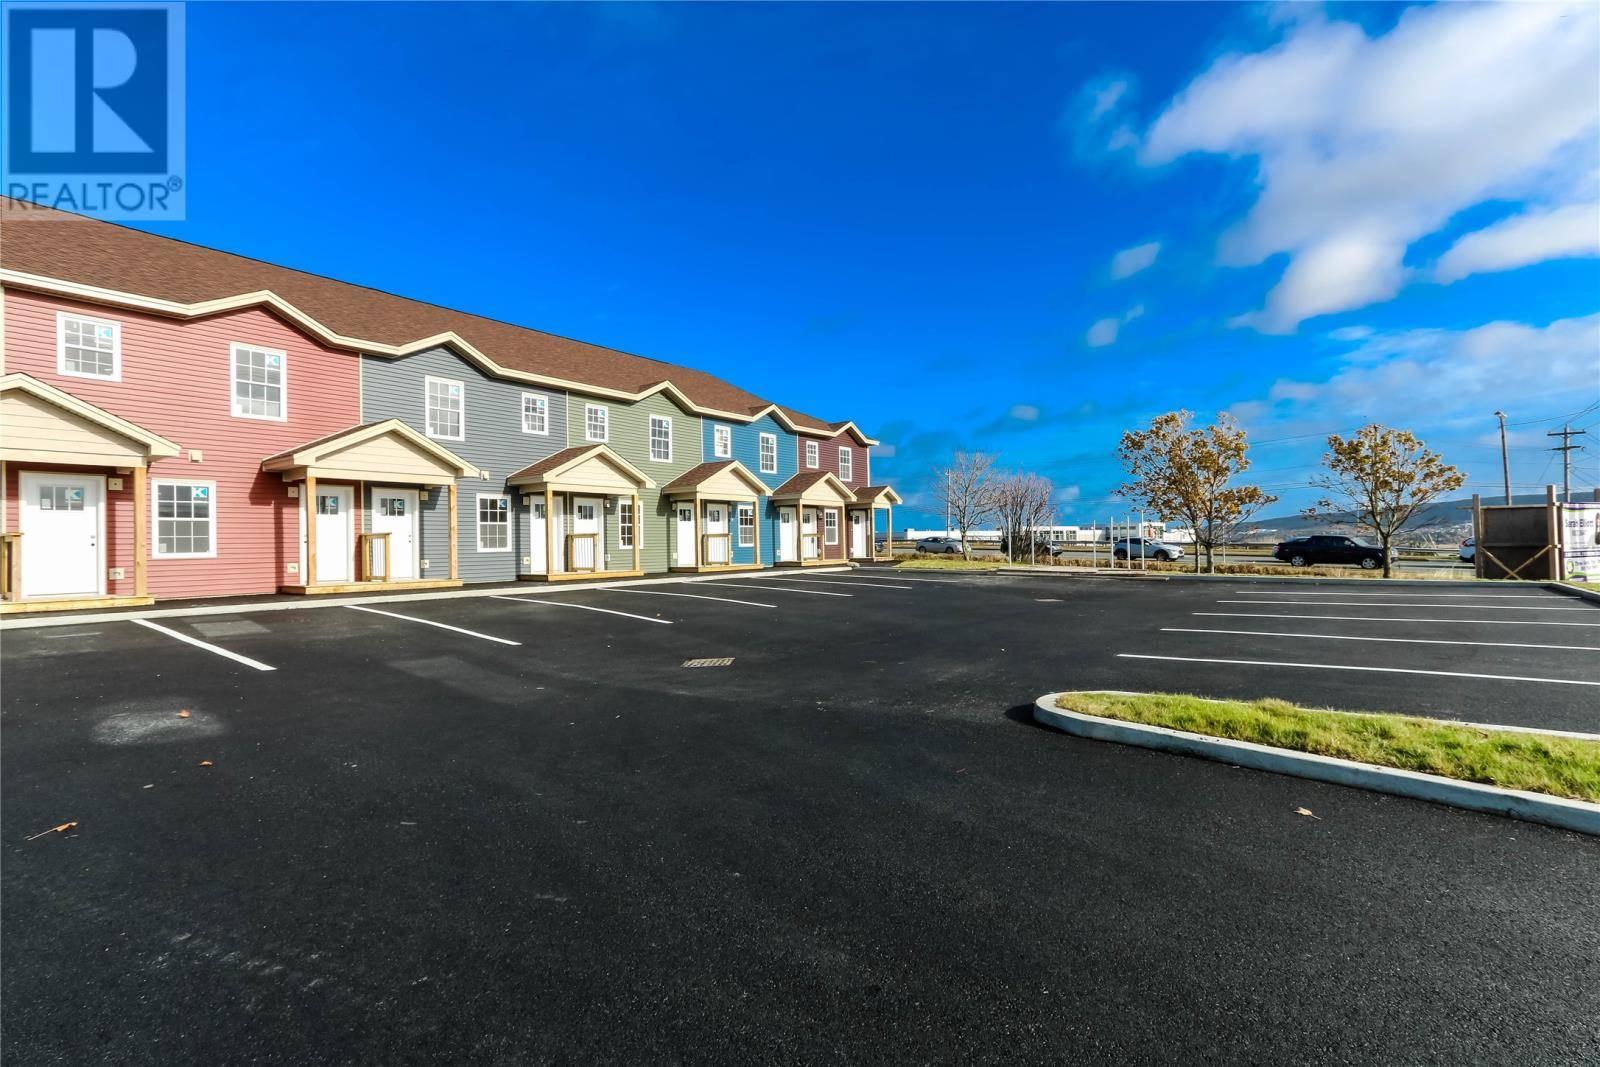 House for sale at 280 Blackmarsh Rd Unit 106 St. John's Newfoundland - MLS: 1205289